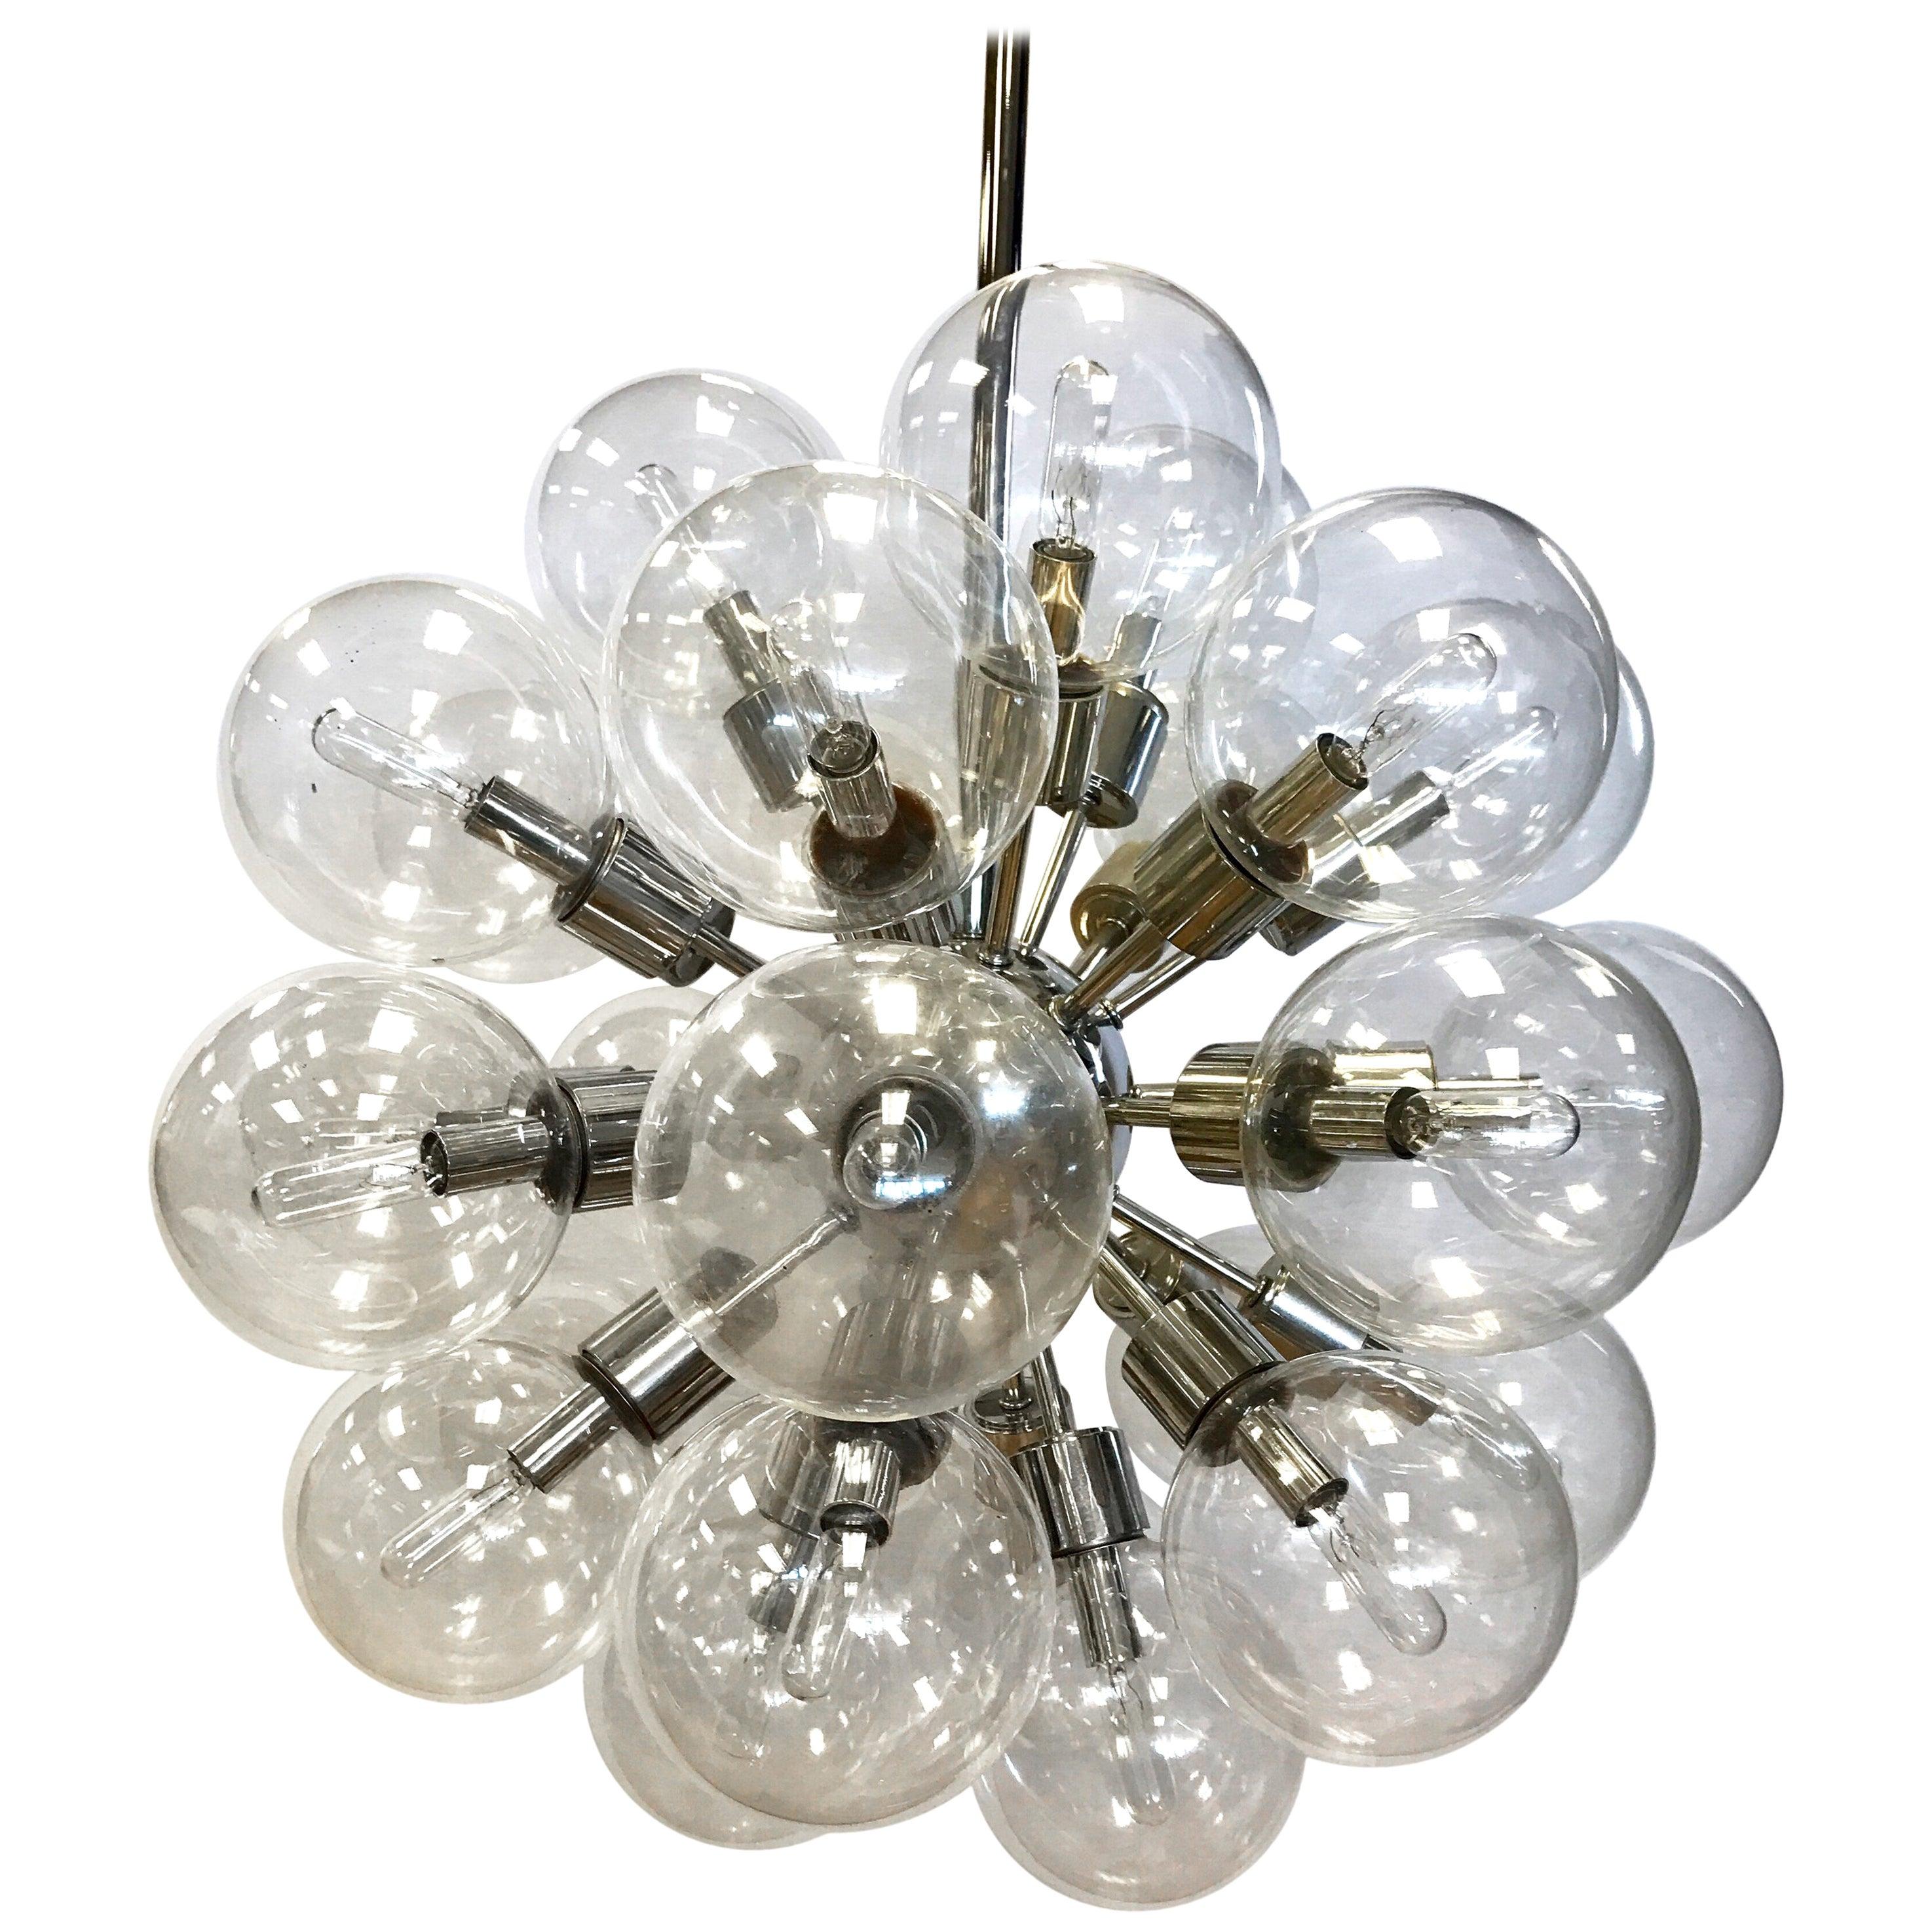 Lightolier 1960s Mid-Century Modern Sputnik Atomic Chandelier 30 Glass Globes